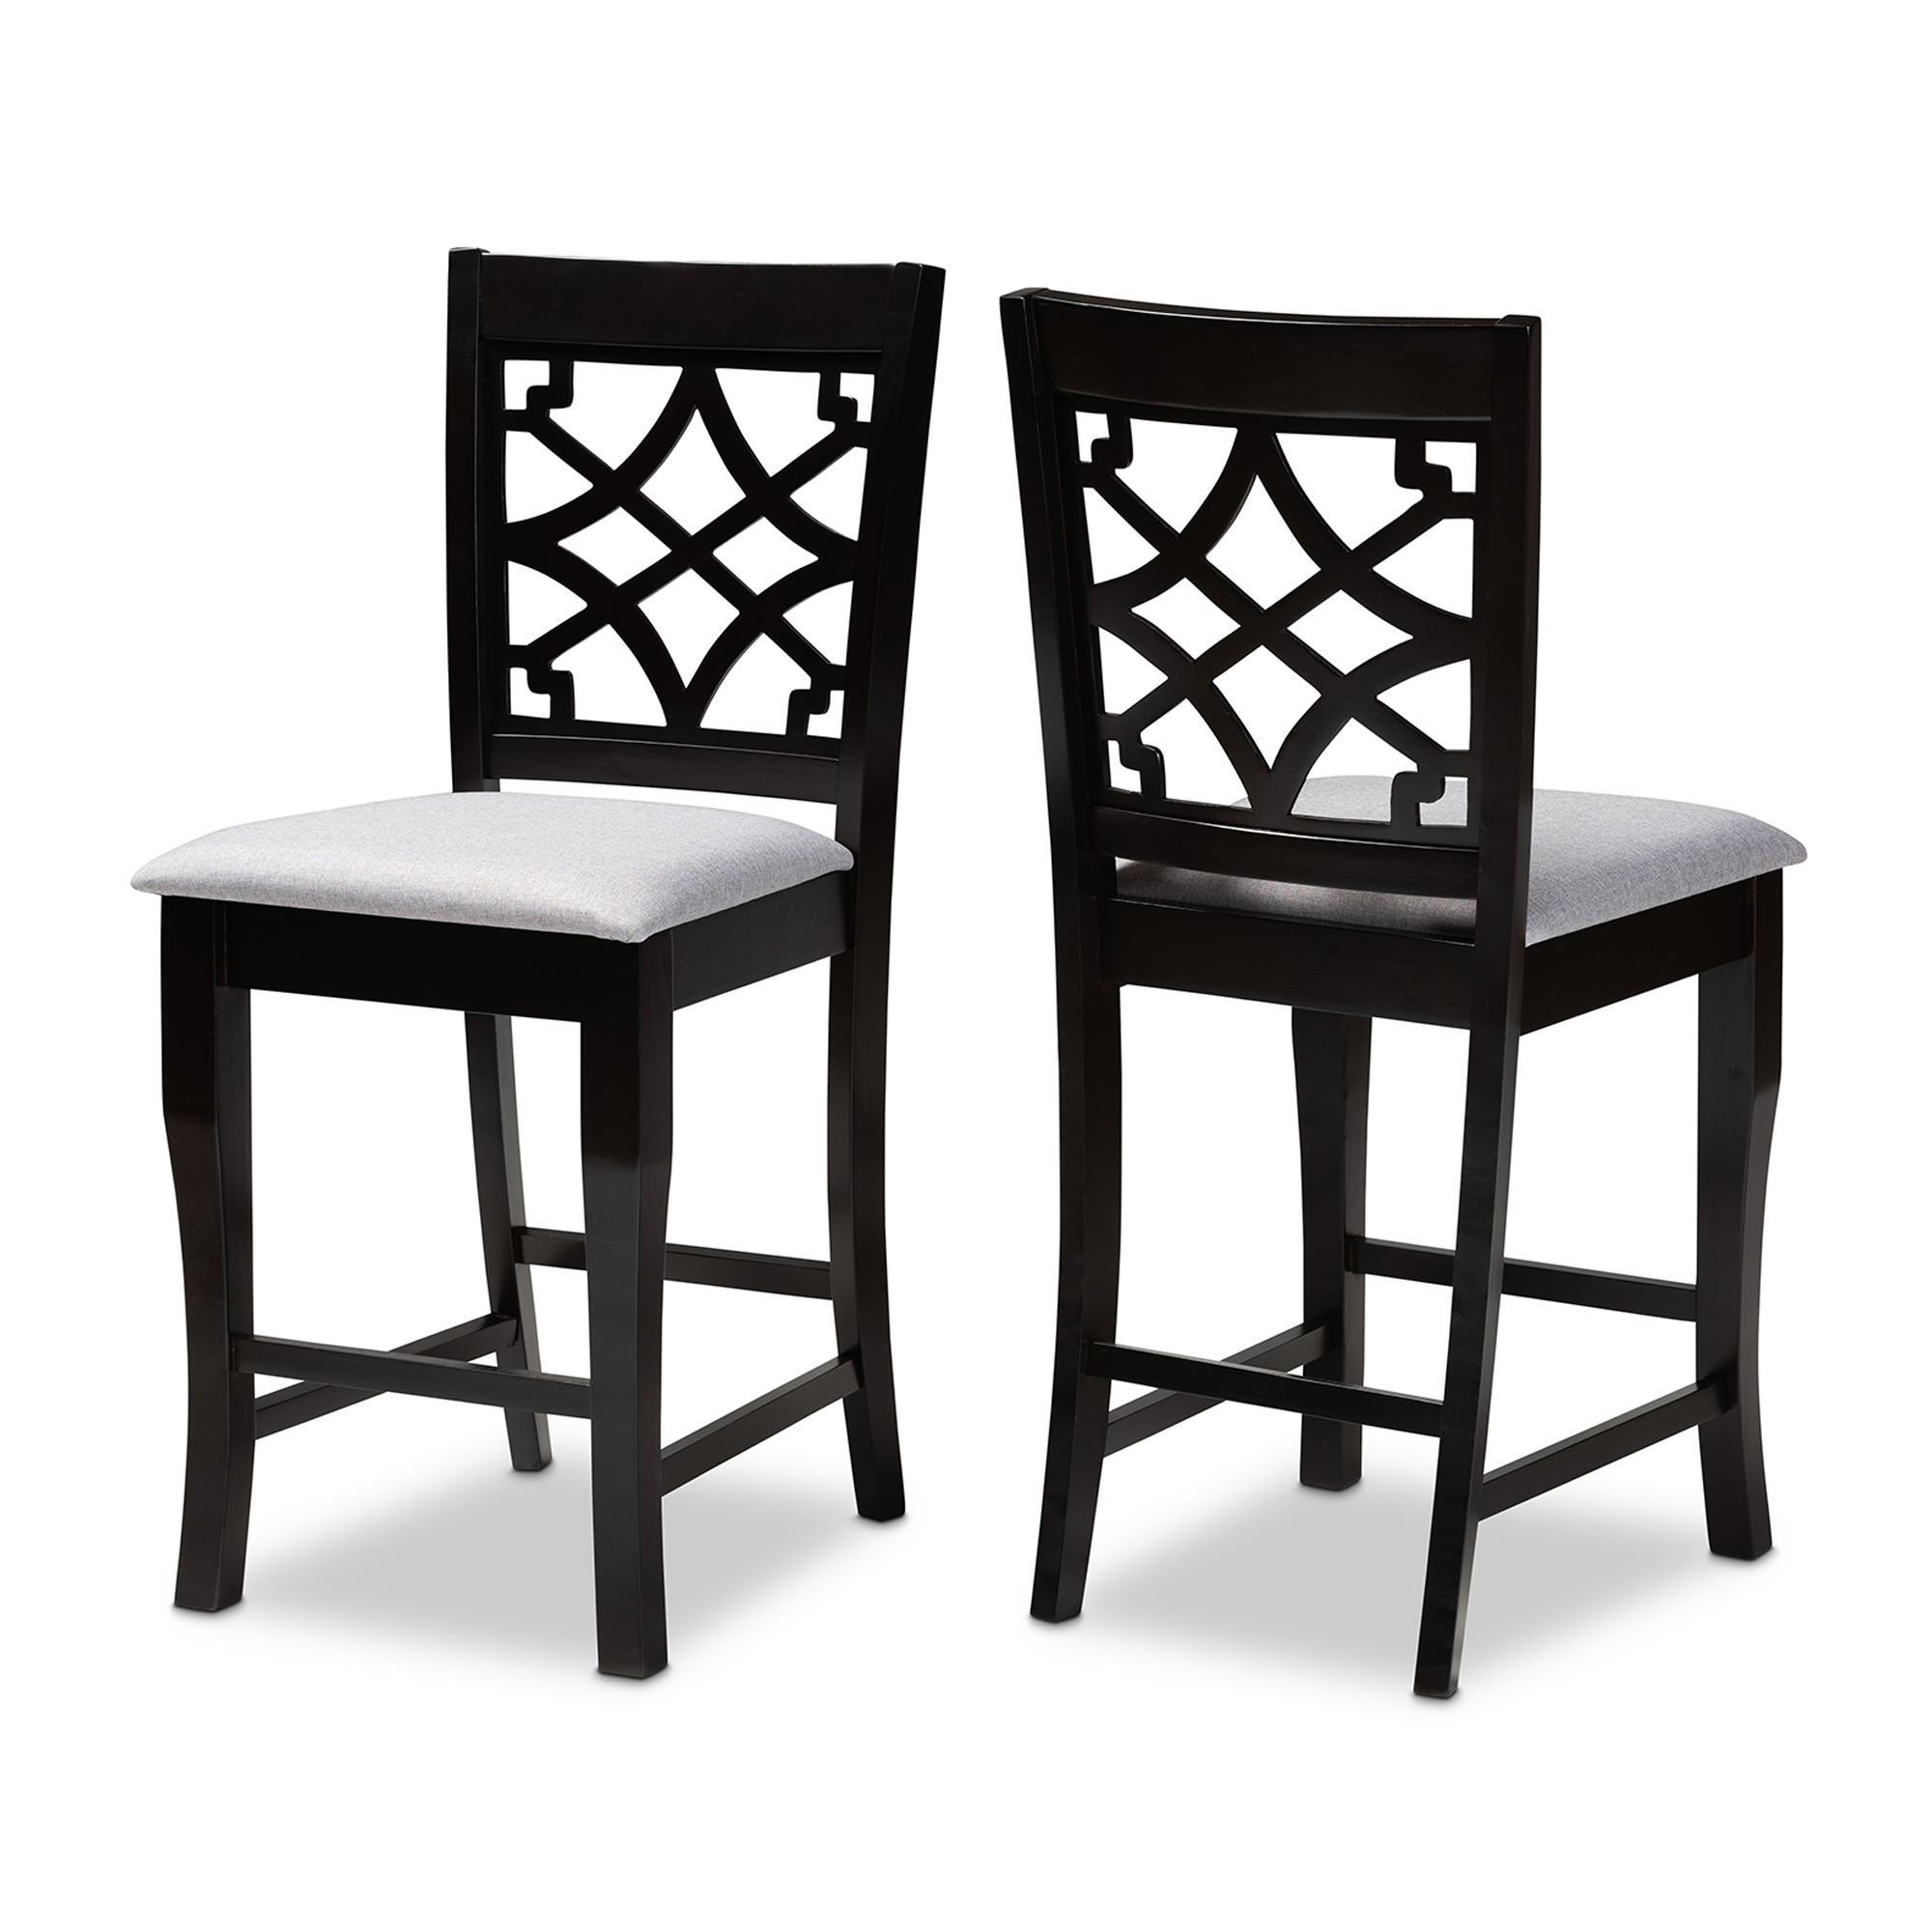 Sensational Baxton Studio Nisa Modern And Contemporary Grey Fabric Andrewgaddart Wooden Chair Designs For Living Room Andrewgaddartcom